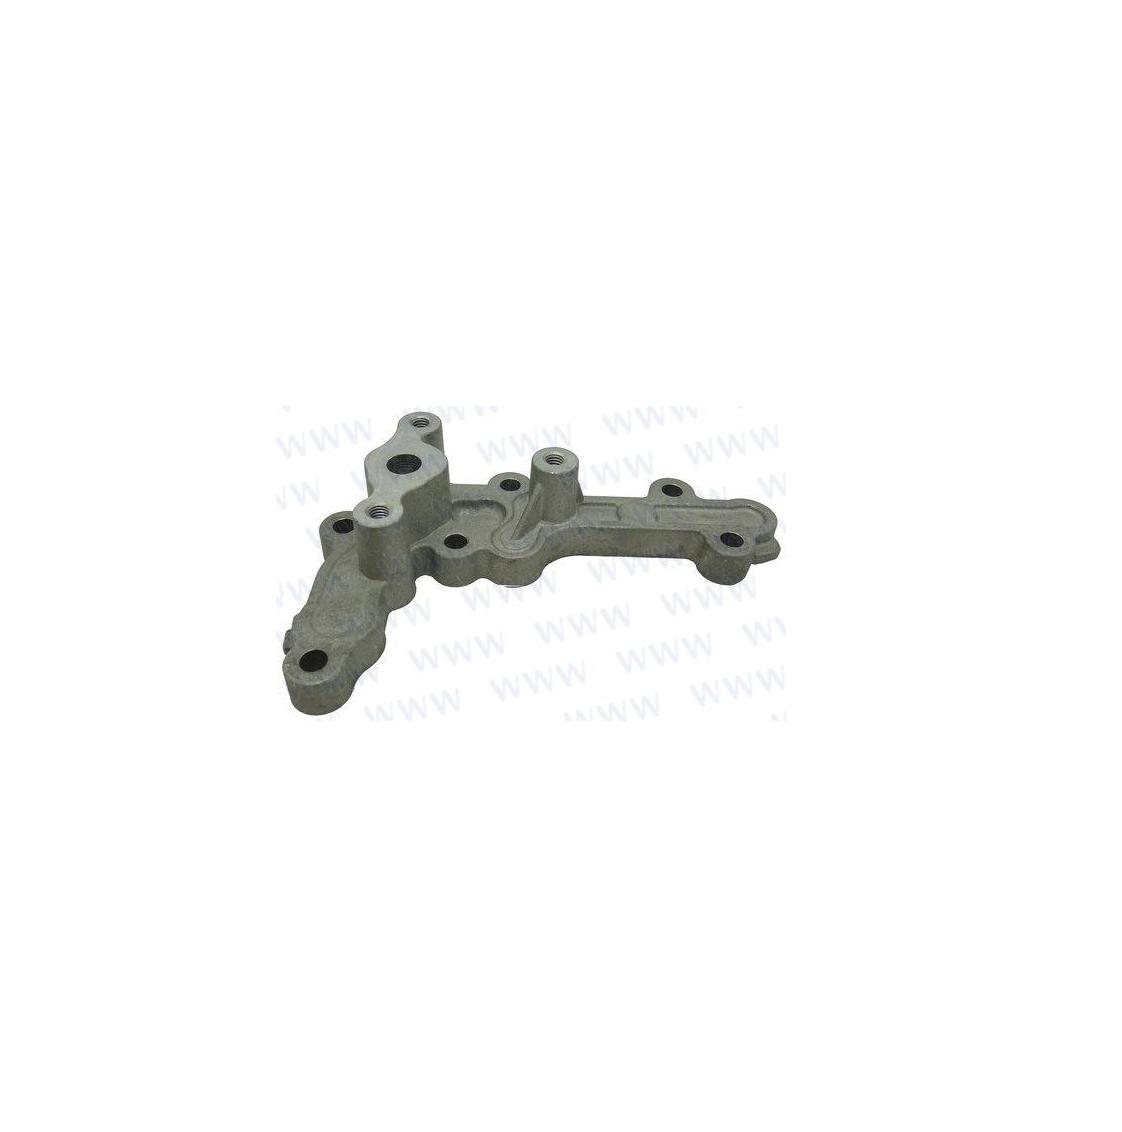 Parsun F50, F60 BRACKET, COURSE STRAINER (PAF60-02010004)